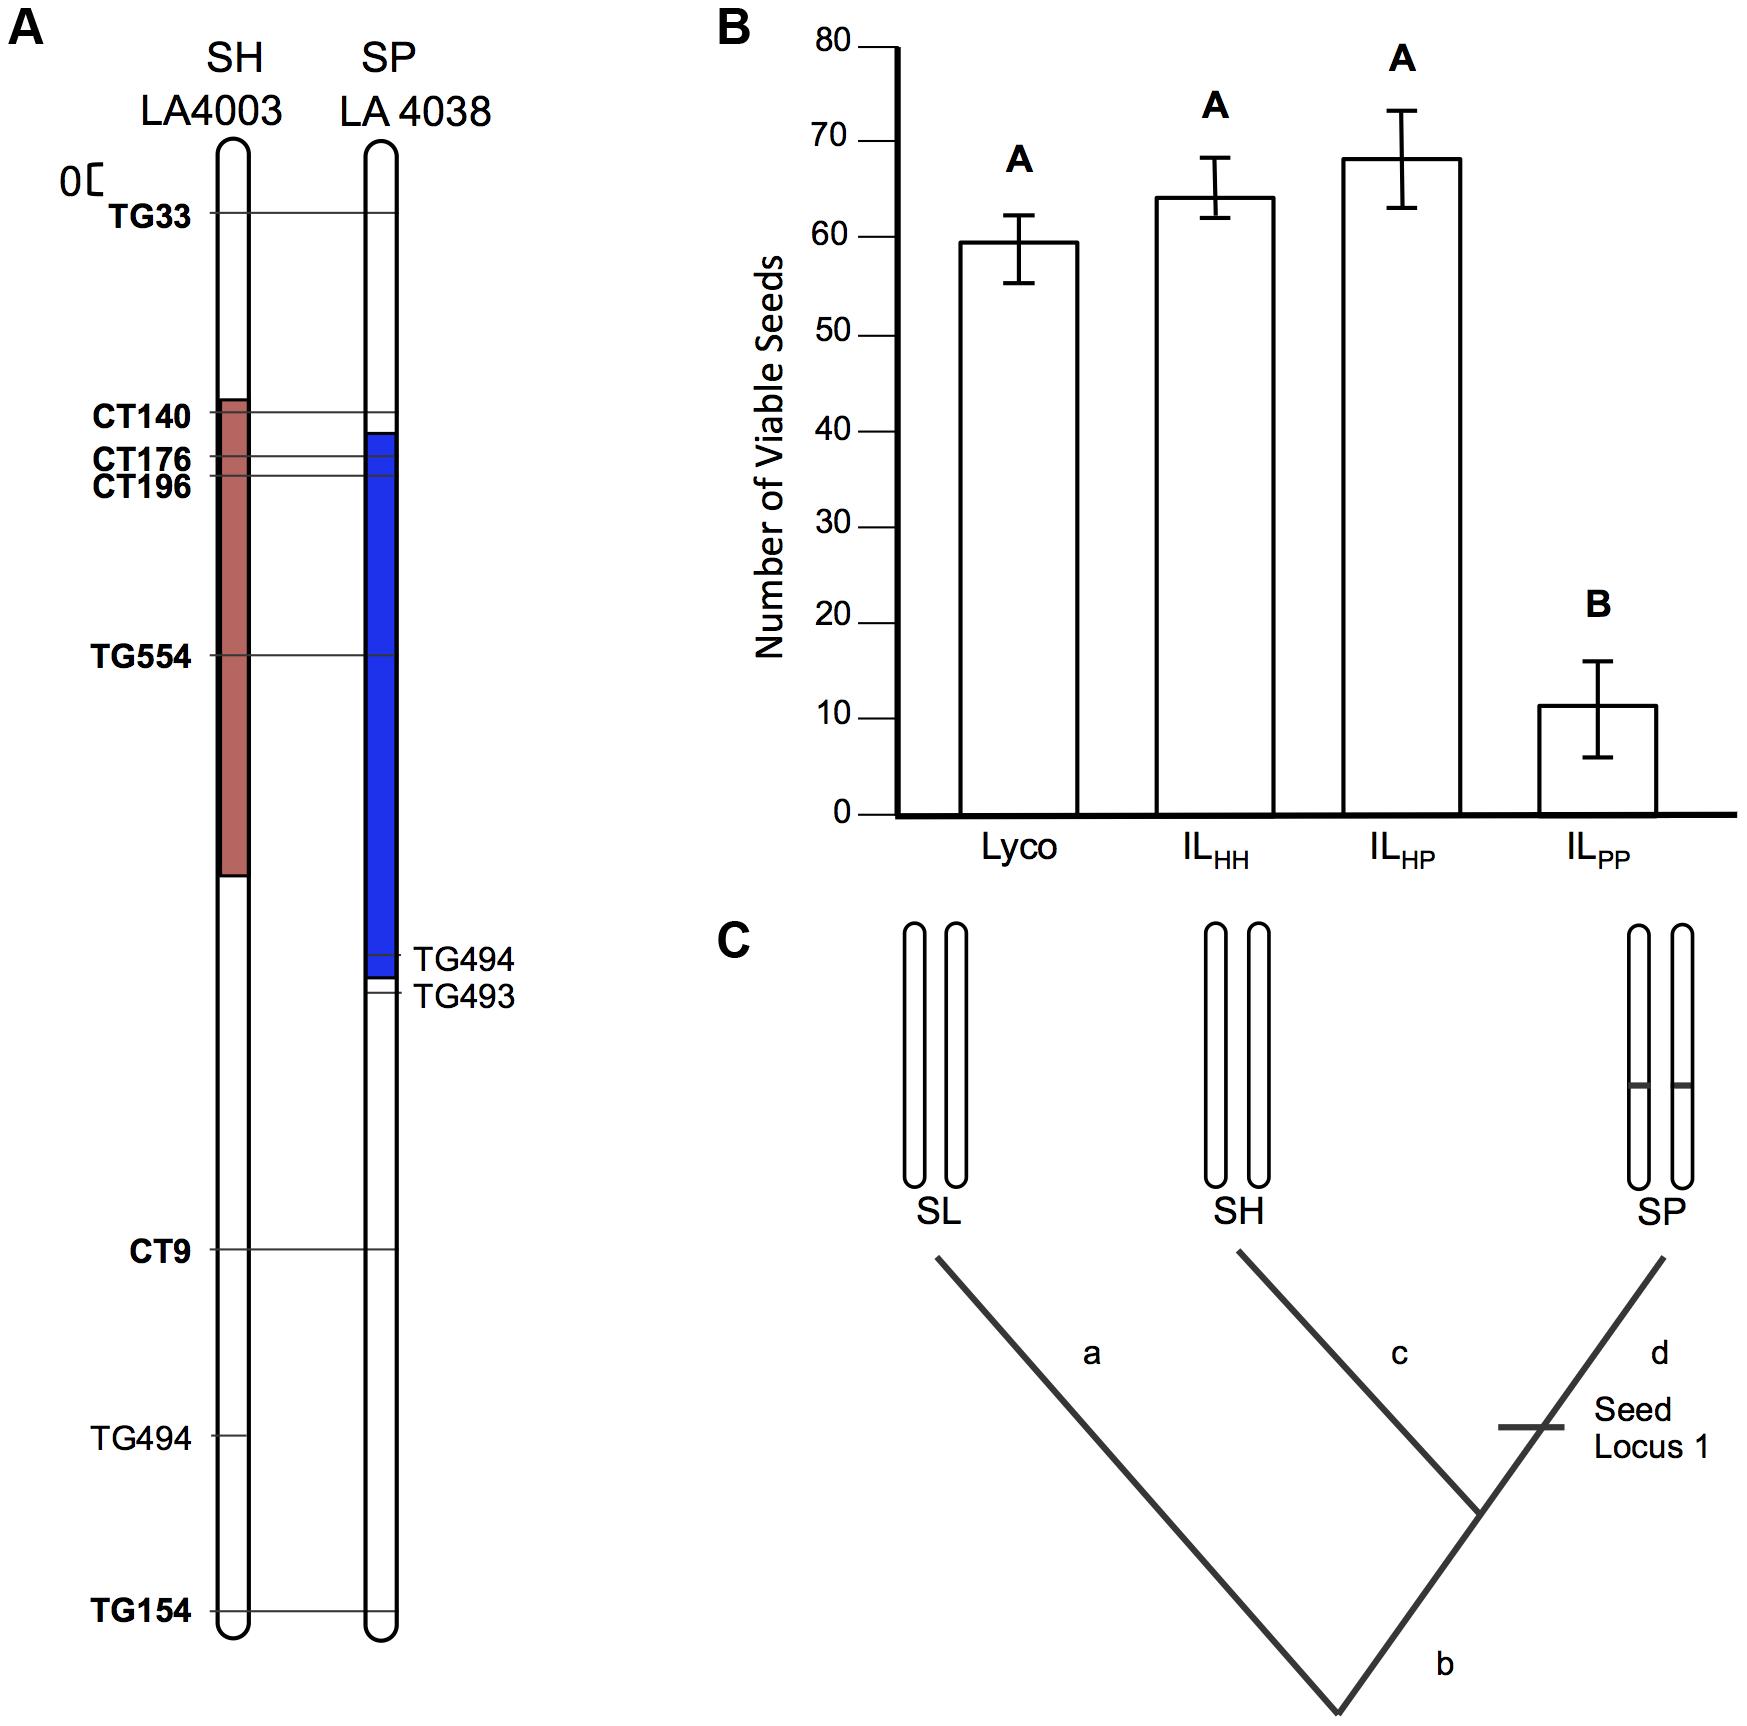 Test of allelism at seed sterility locus <i>sss2.1</i>.